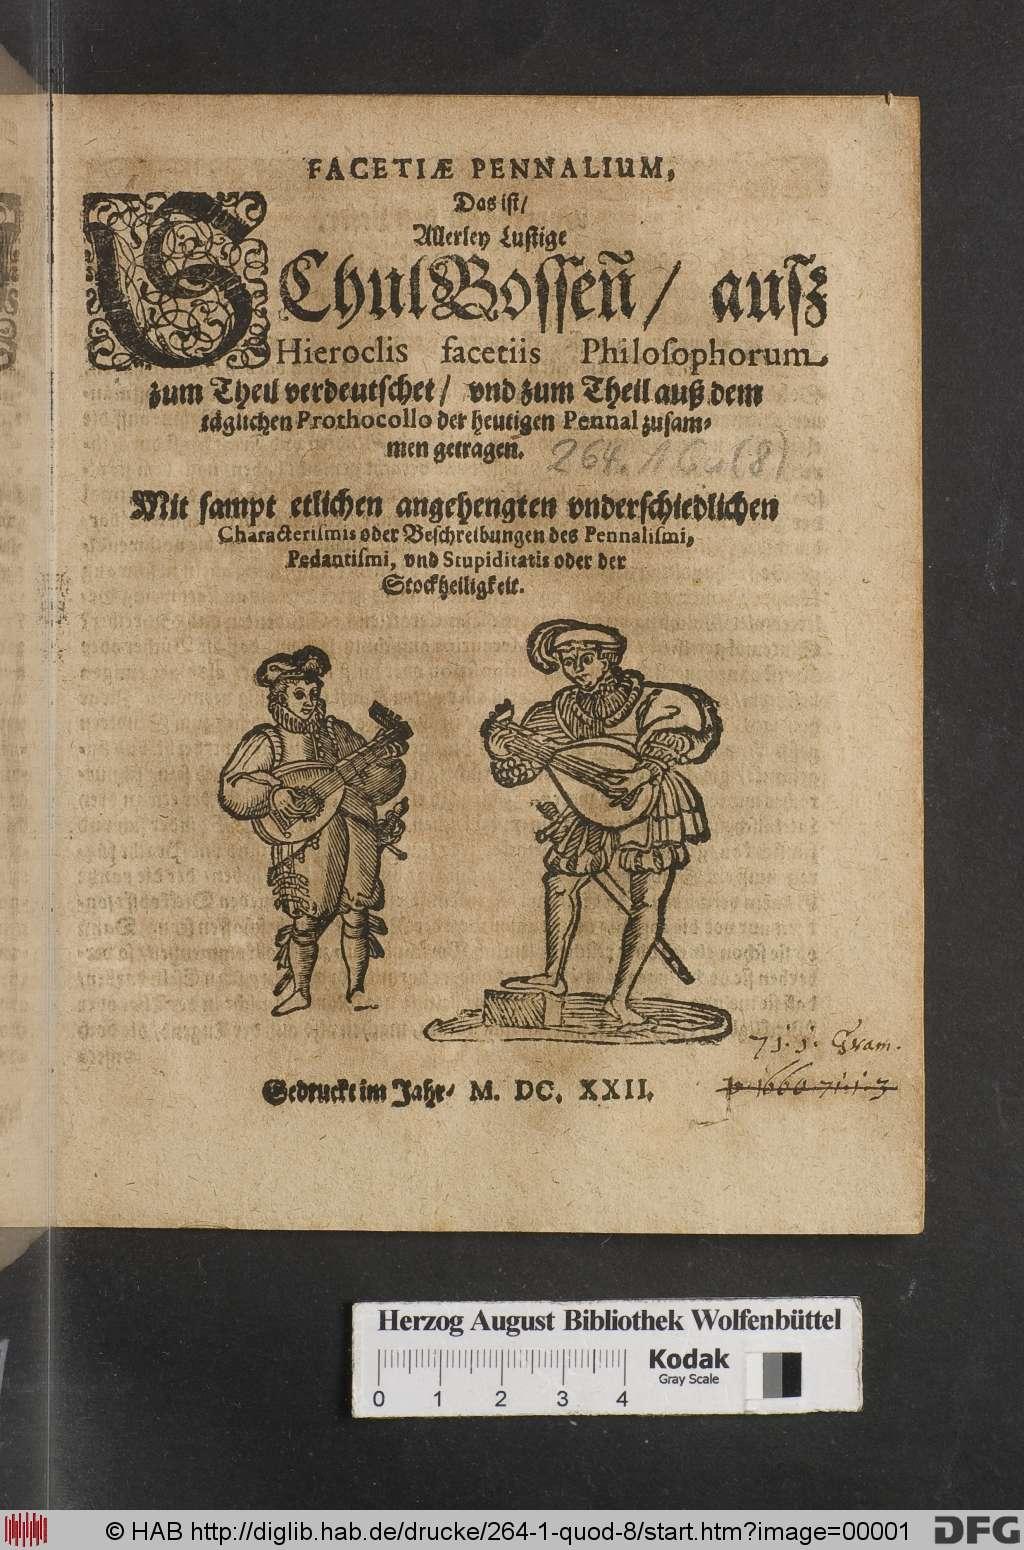 http://diglib.hab.de/drucke/264-1-quod-8/00001.jpg